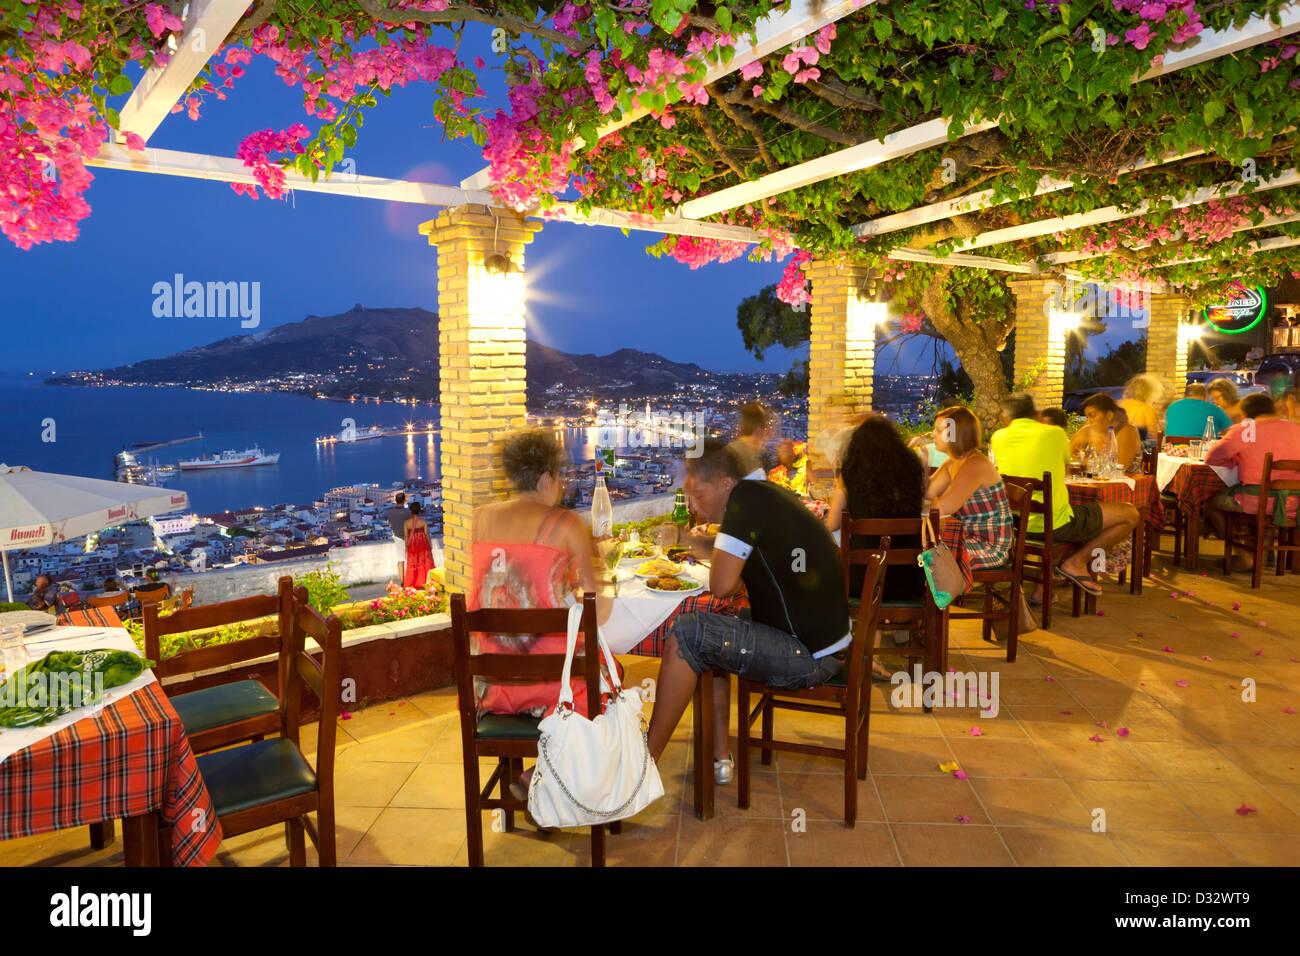 Restaurant on Bochali Hill overlooking Zakynthos Town - Stock Image